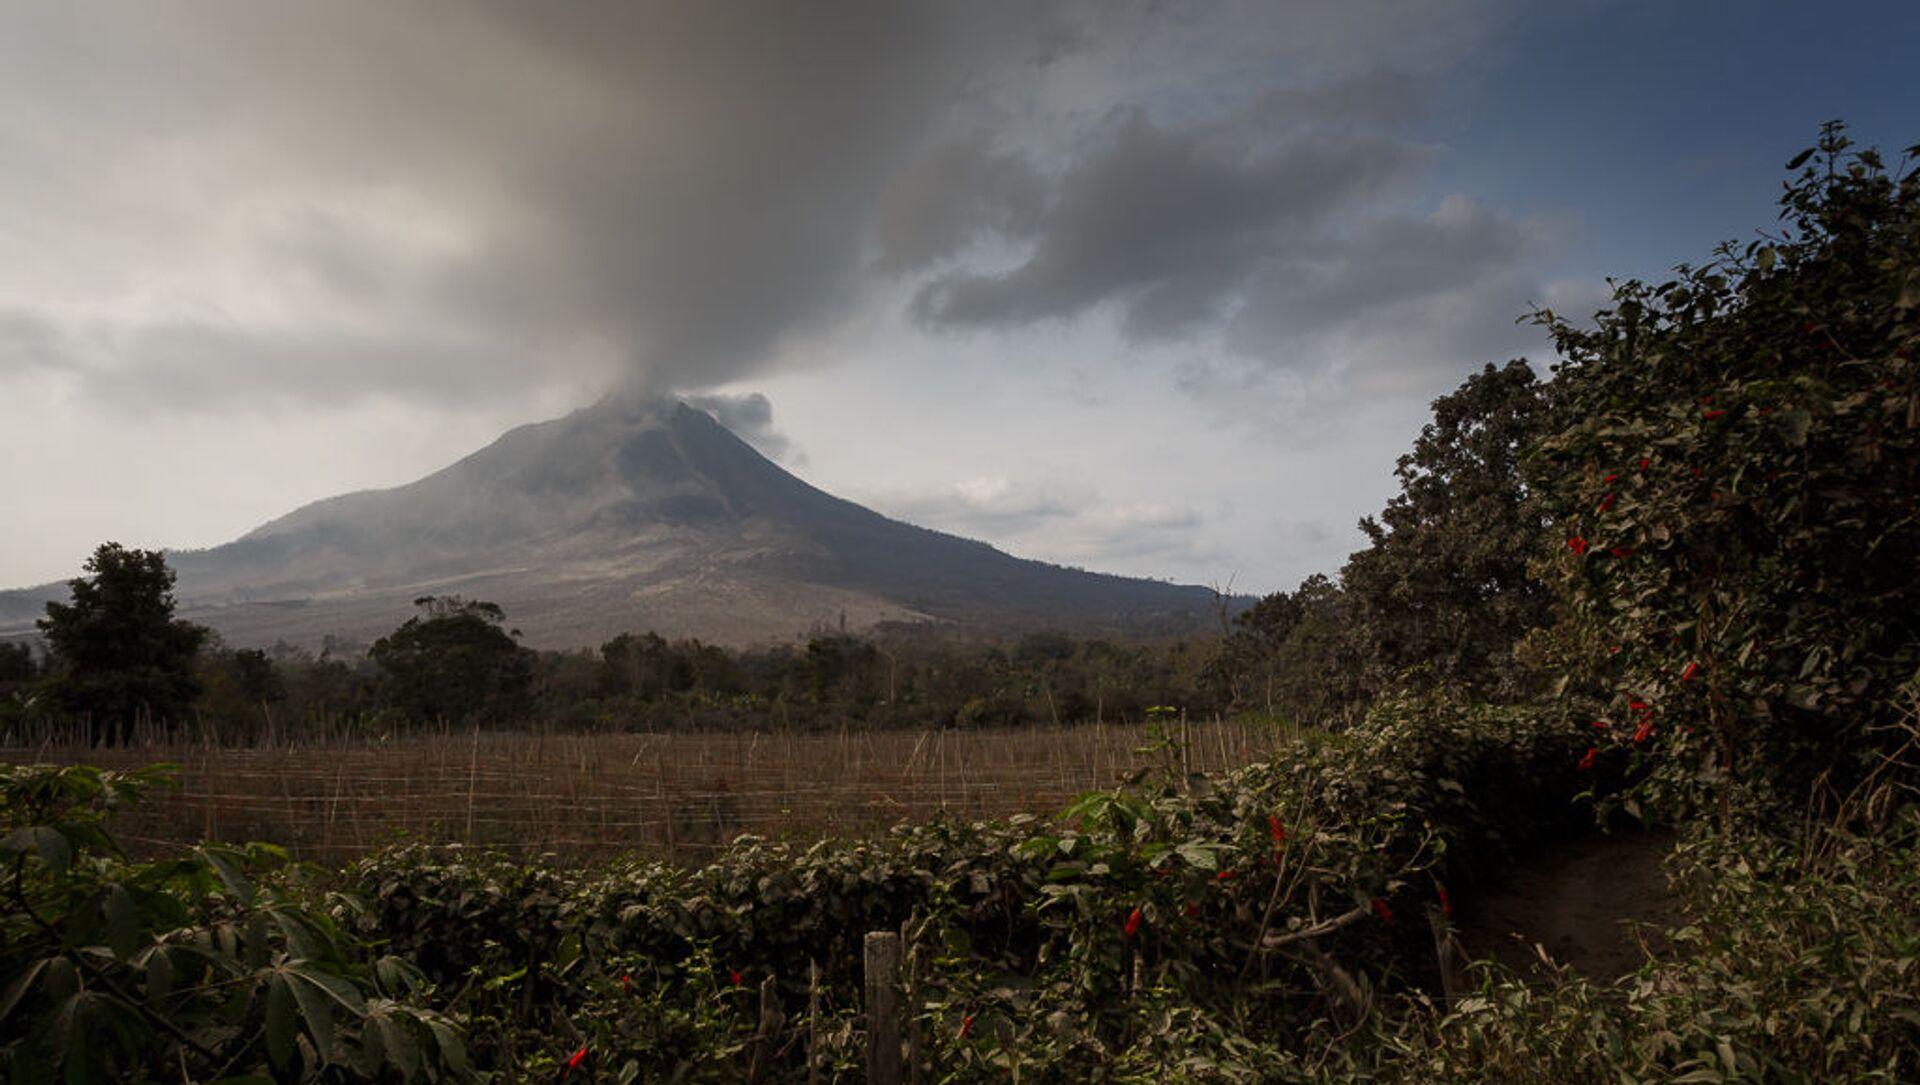 A field in the background of the Mount Sinabung Eruption. Medan, Indonesia, 29 Jan 2014 - Sputnik International, 1920, 28.07.2021